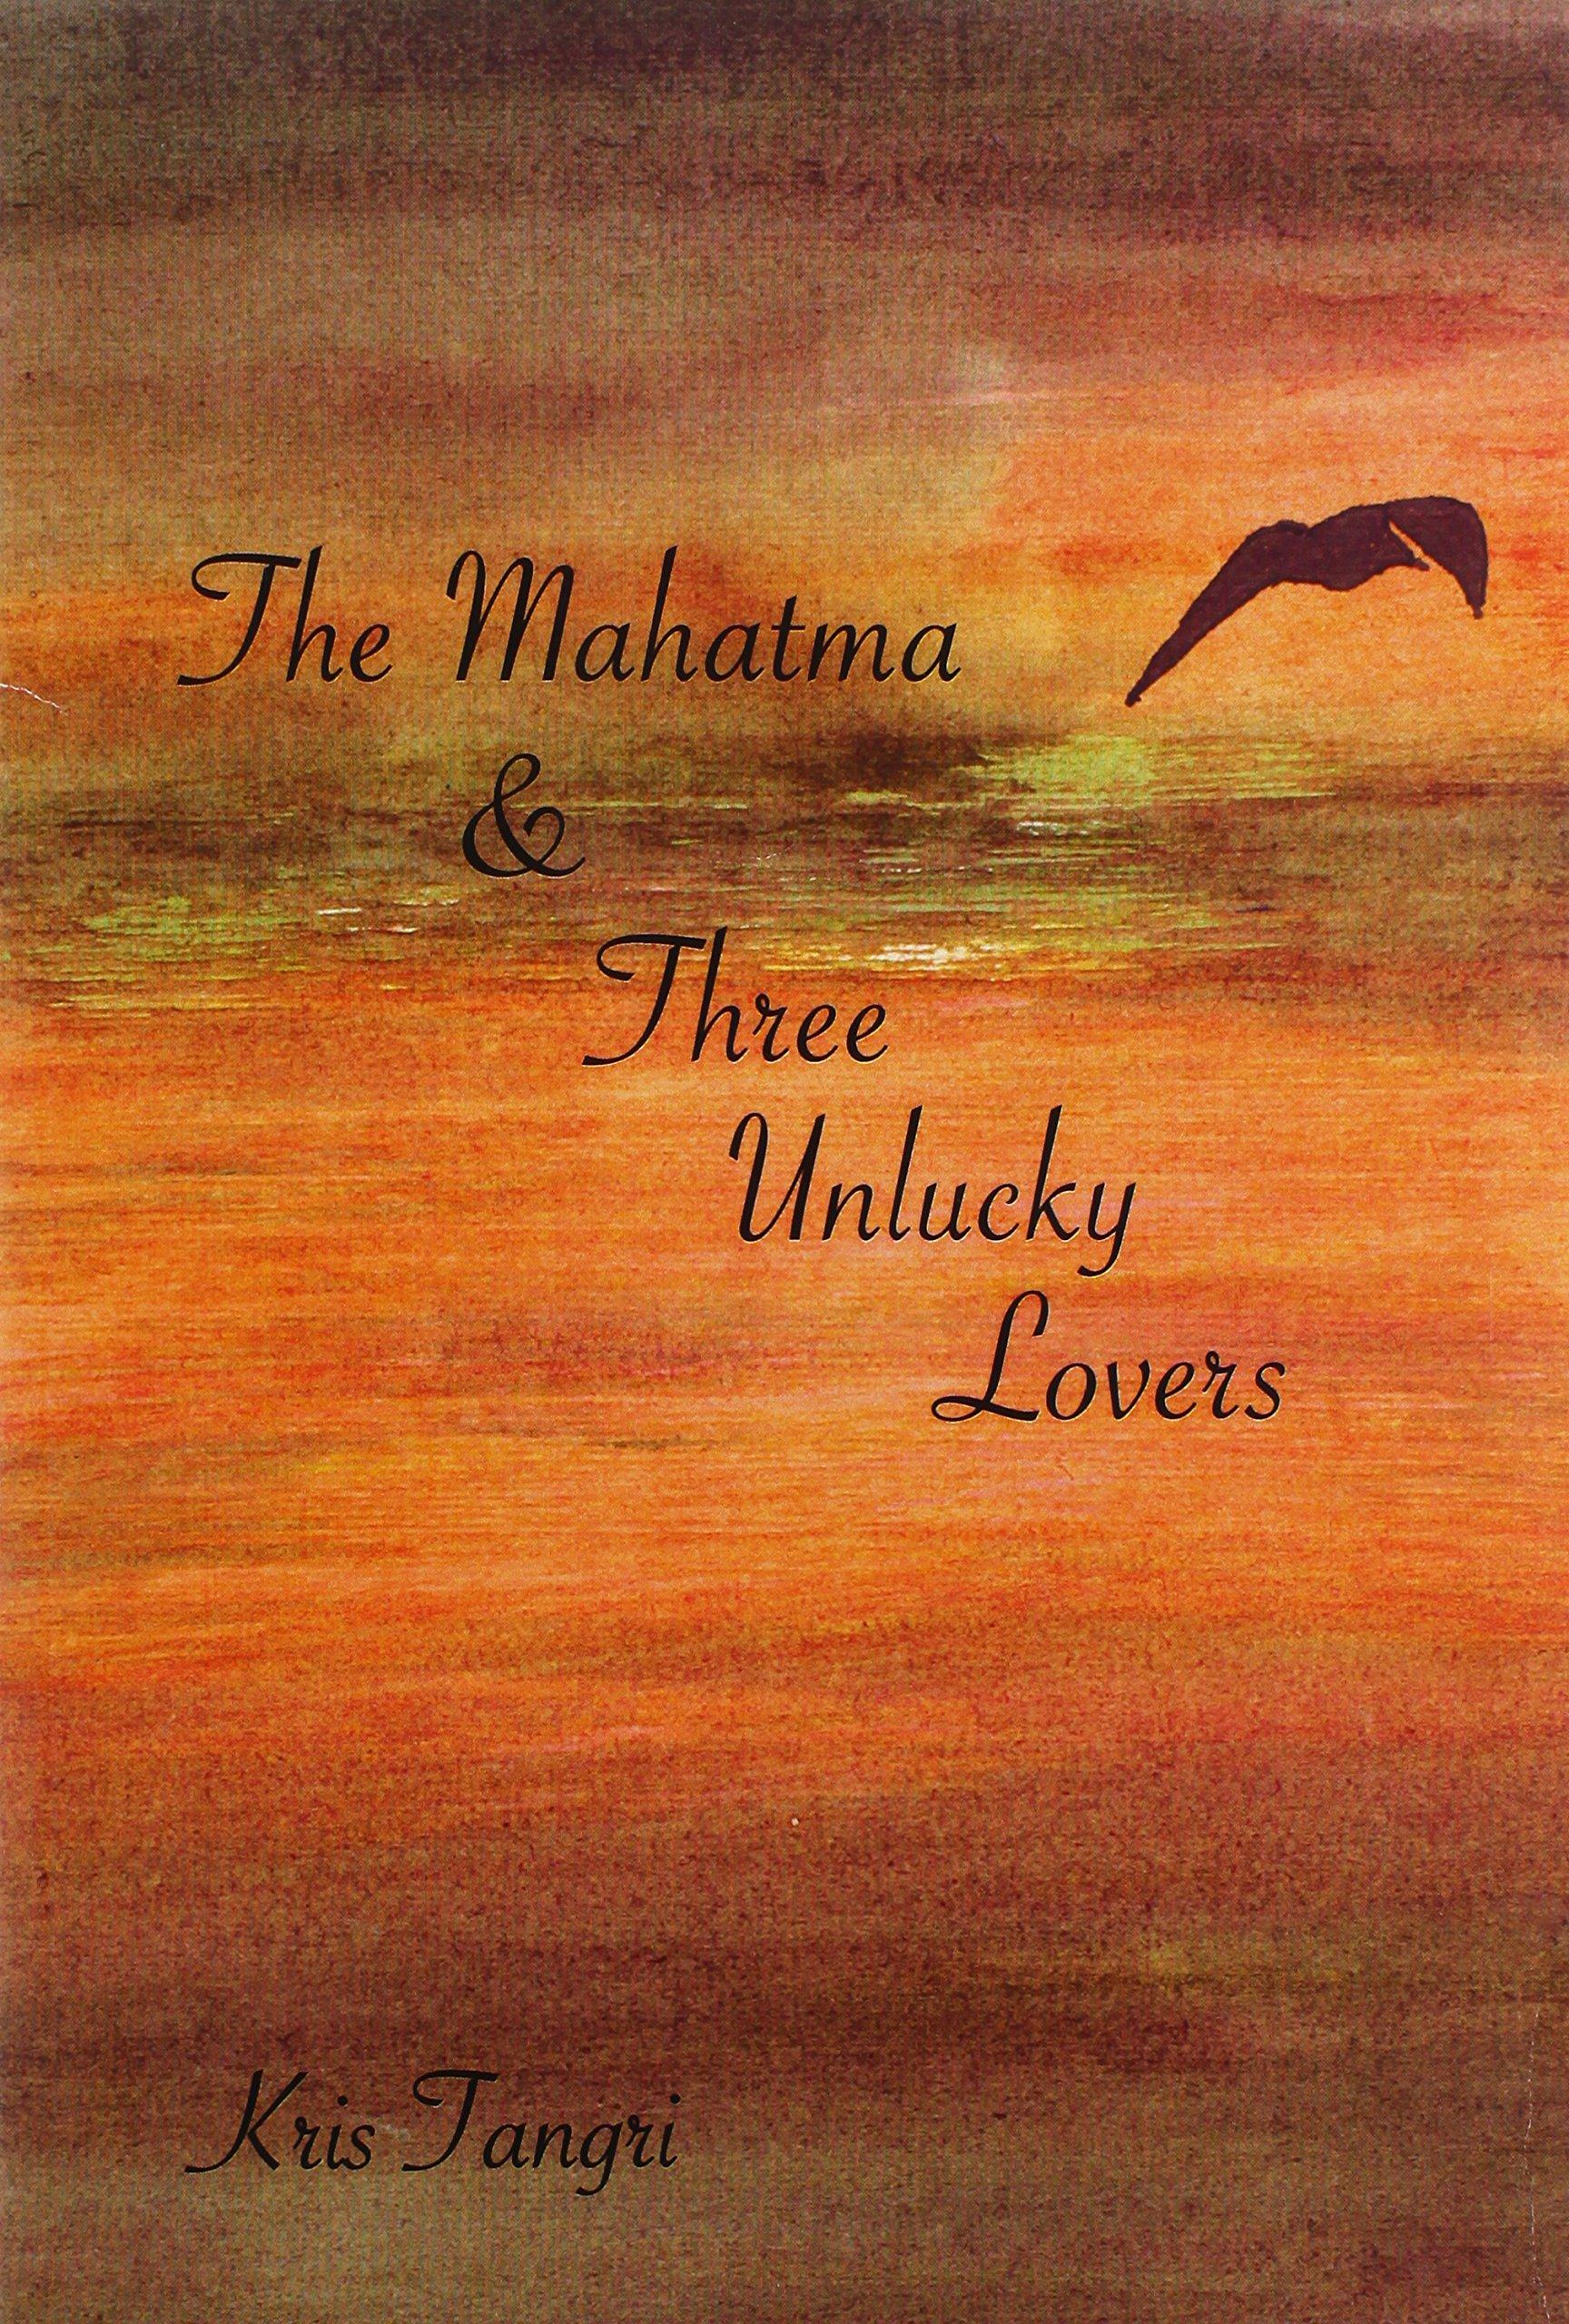 The Mahatma & Three Unlucky Lovers ebook